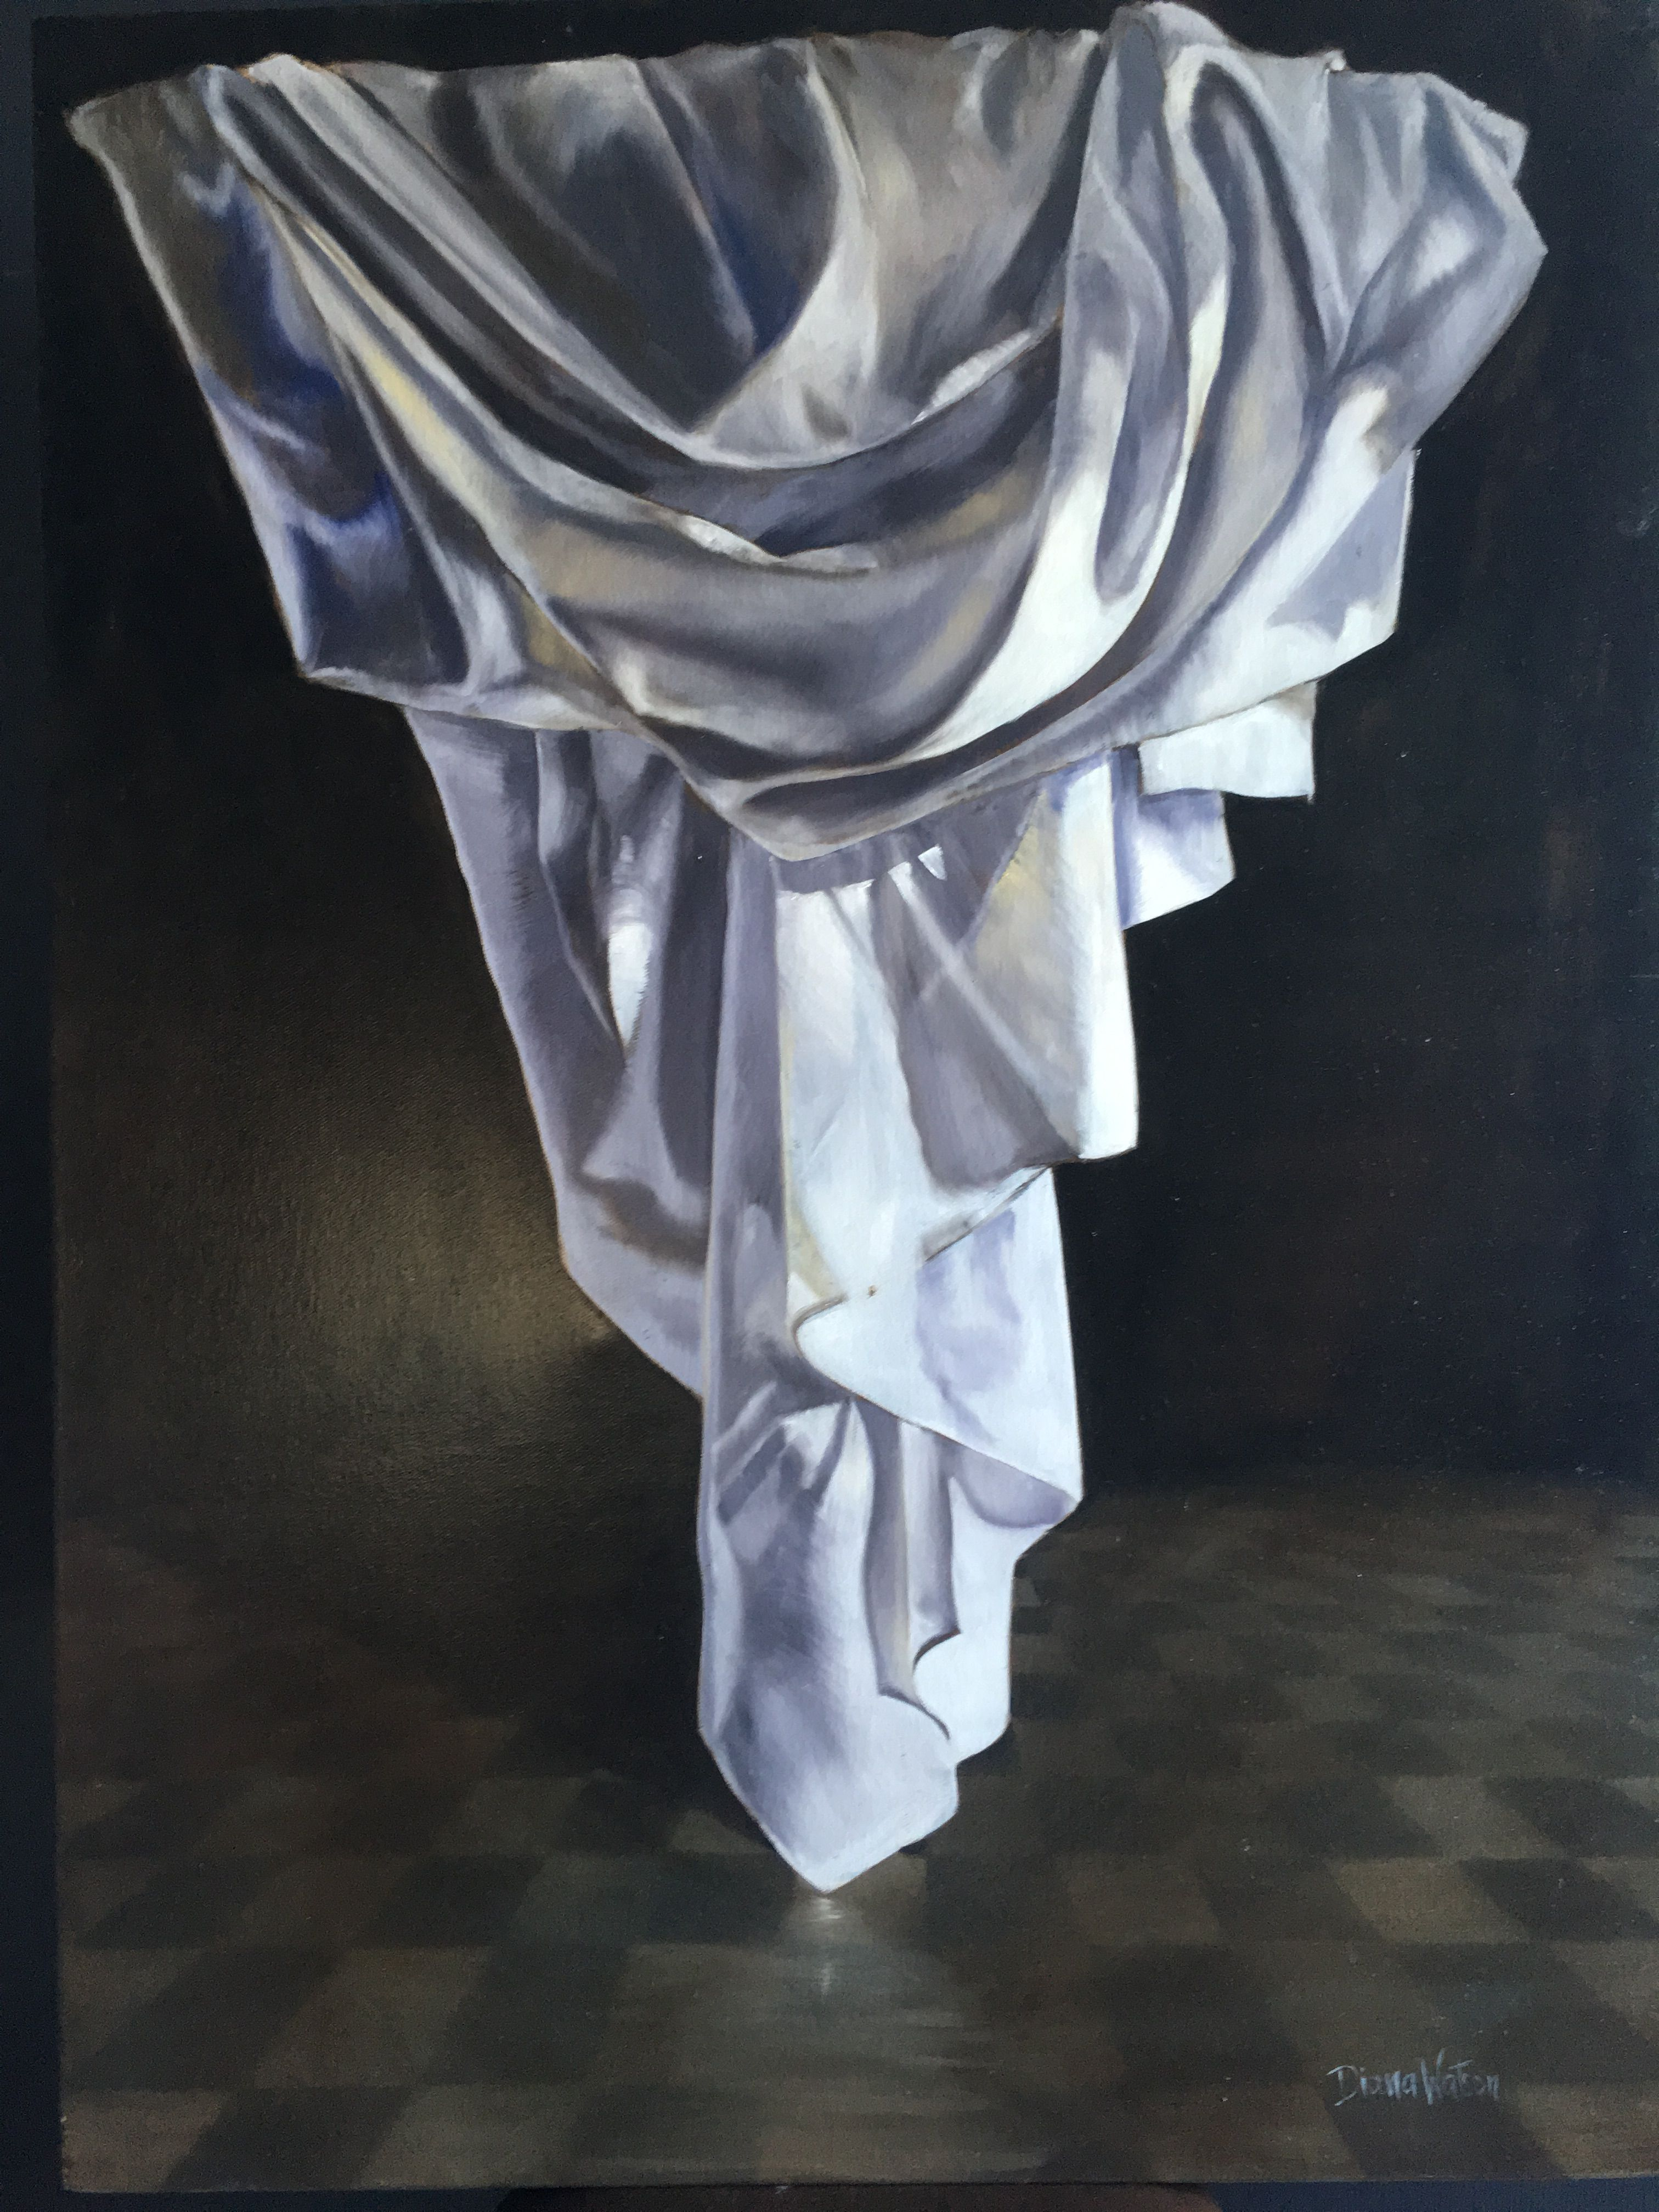 Diana Watson 'Sybilene' 112x84 (With images) Art, Linton